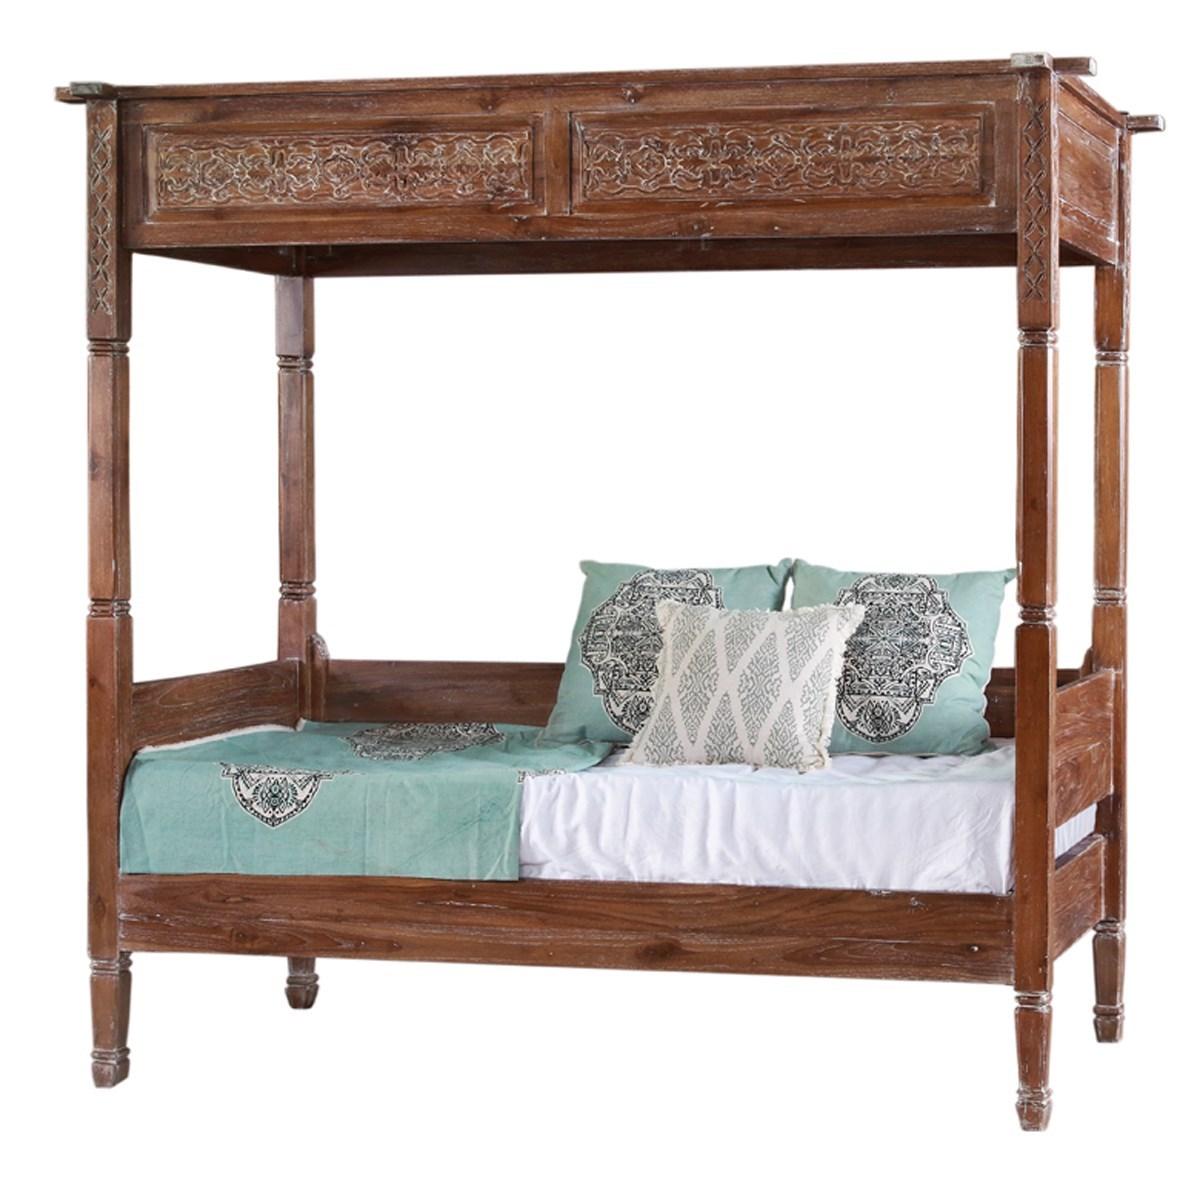 Carved Canopy Bed - Teak